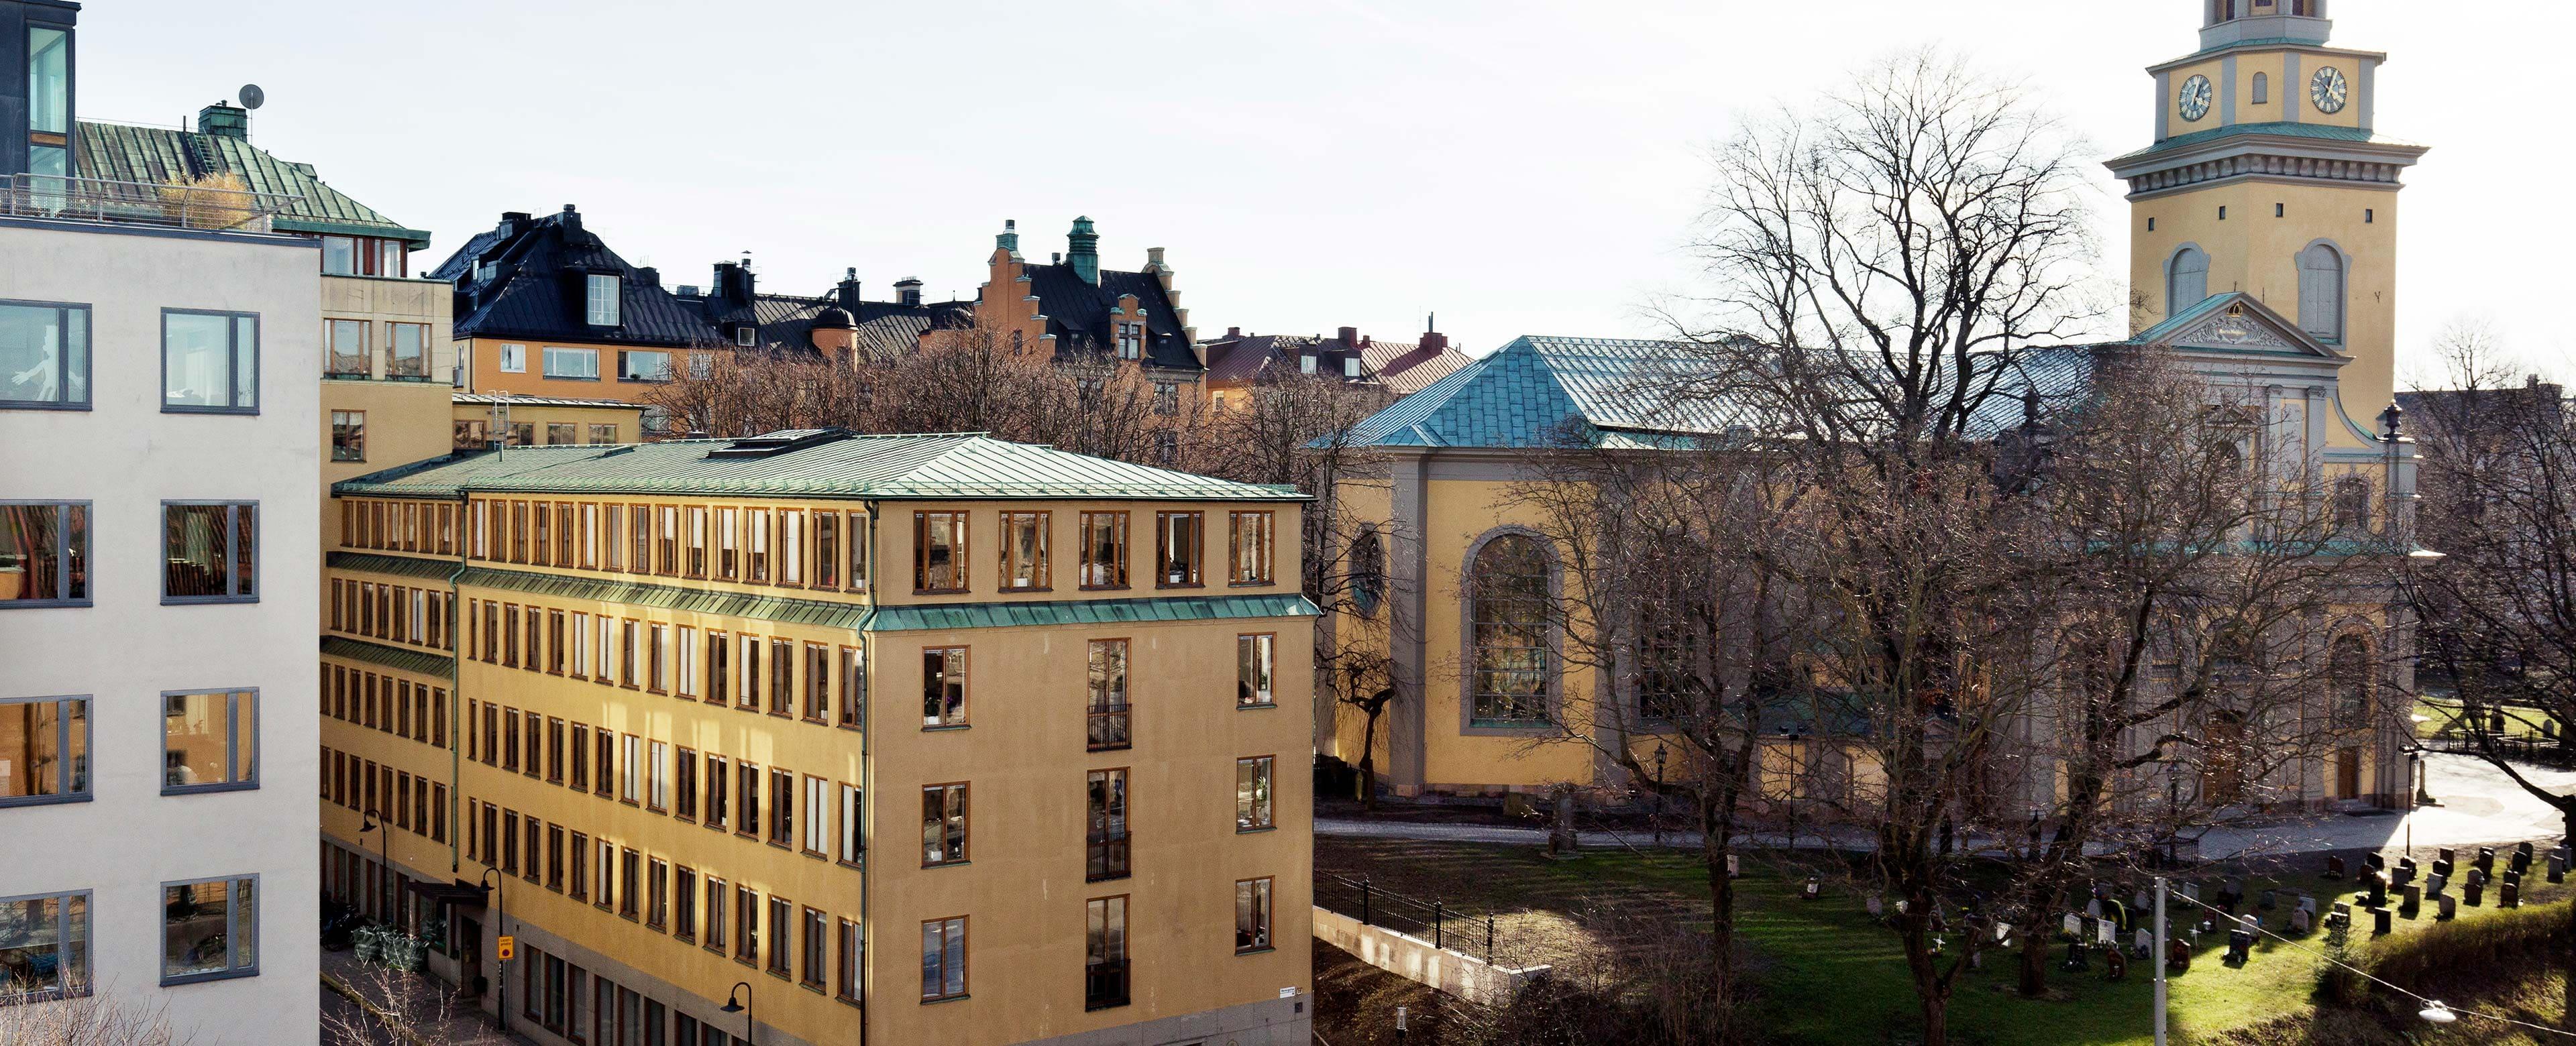 Lediga rum kontorshotell Hornsgatan